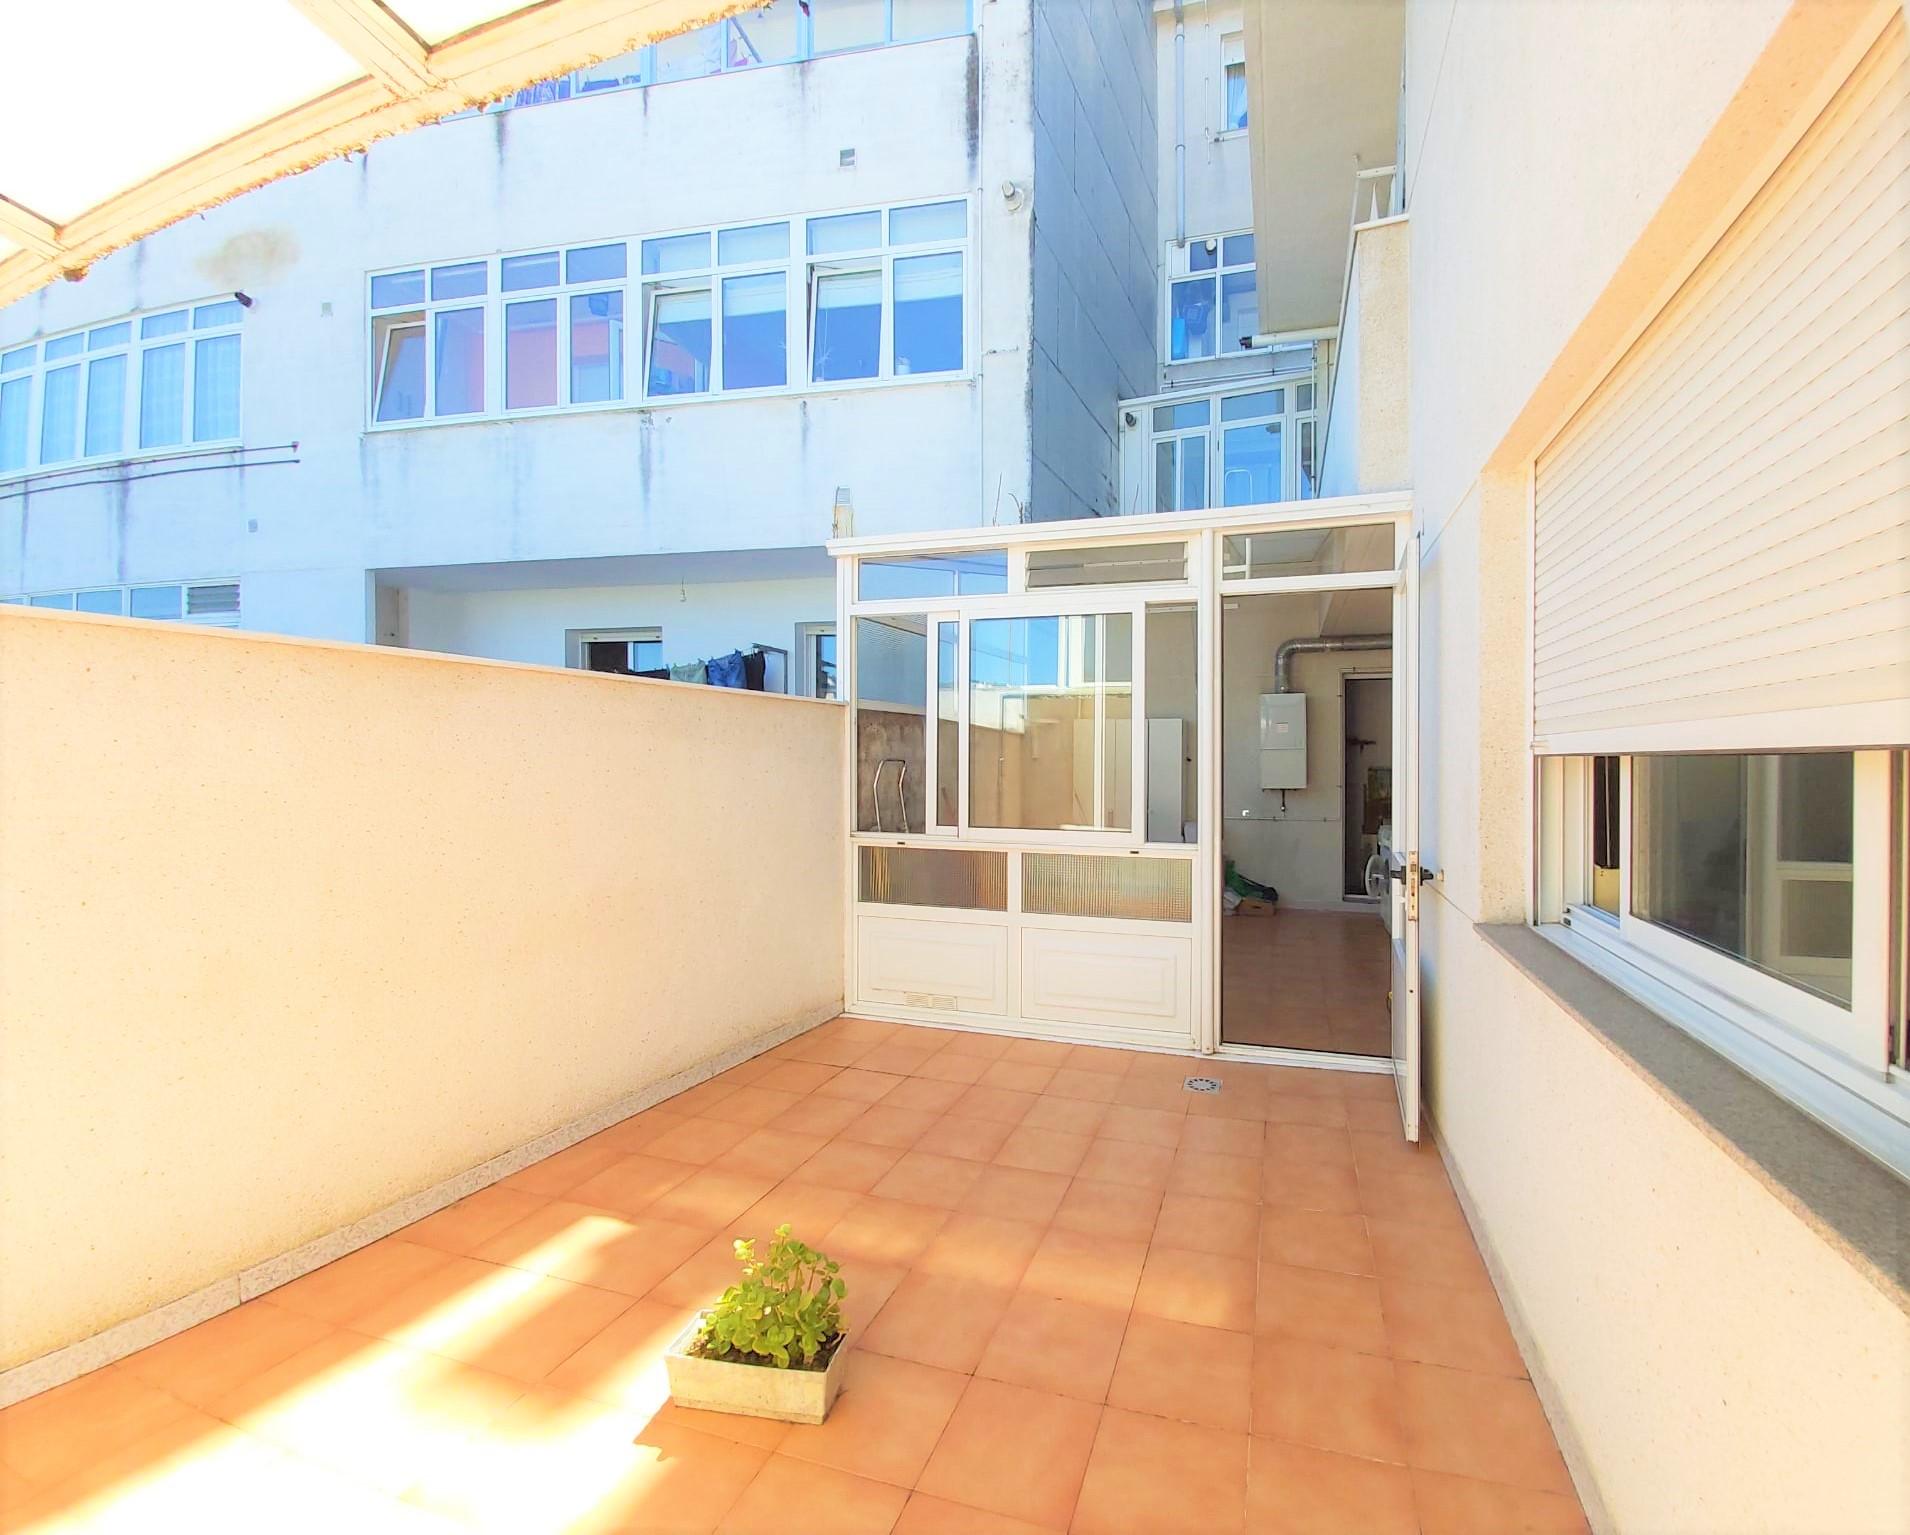 Apartamento sin amueblar con terraza – en calle Alvedro (Lugo)